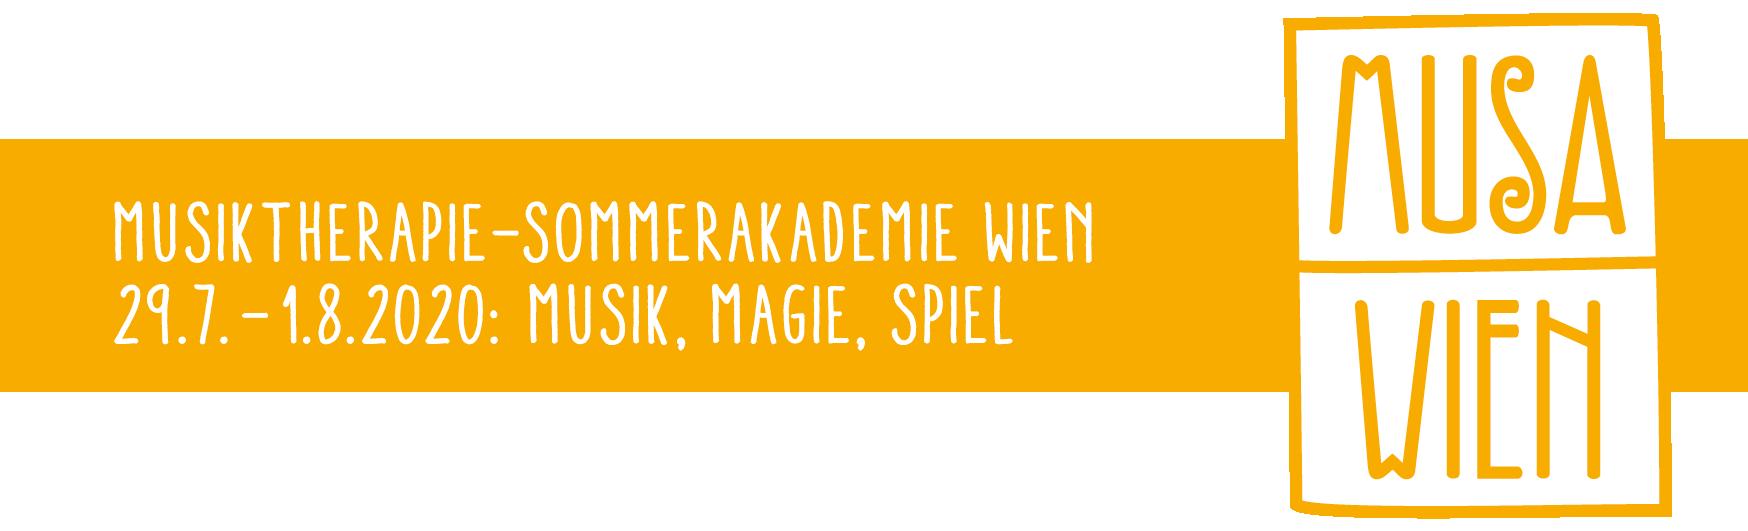 Musiktherapie-Sommerakademie Wien